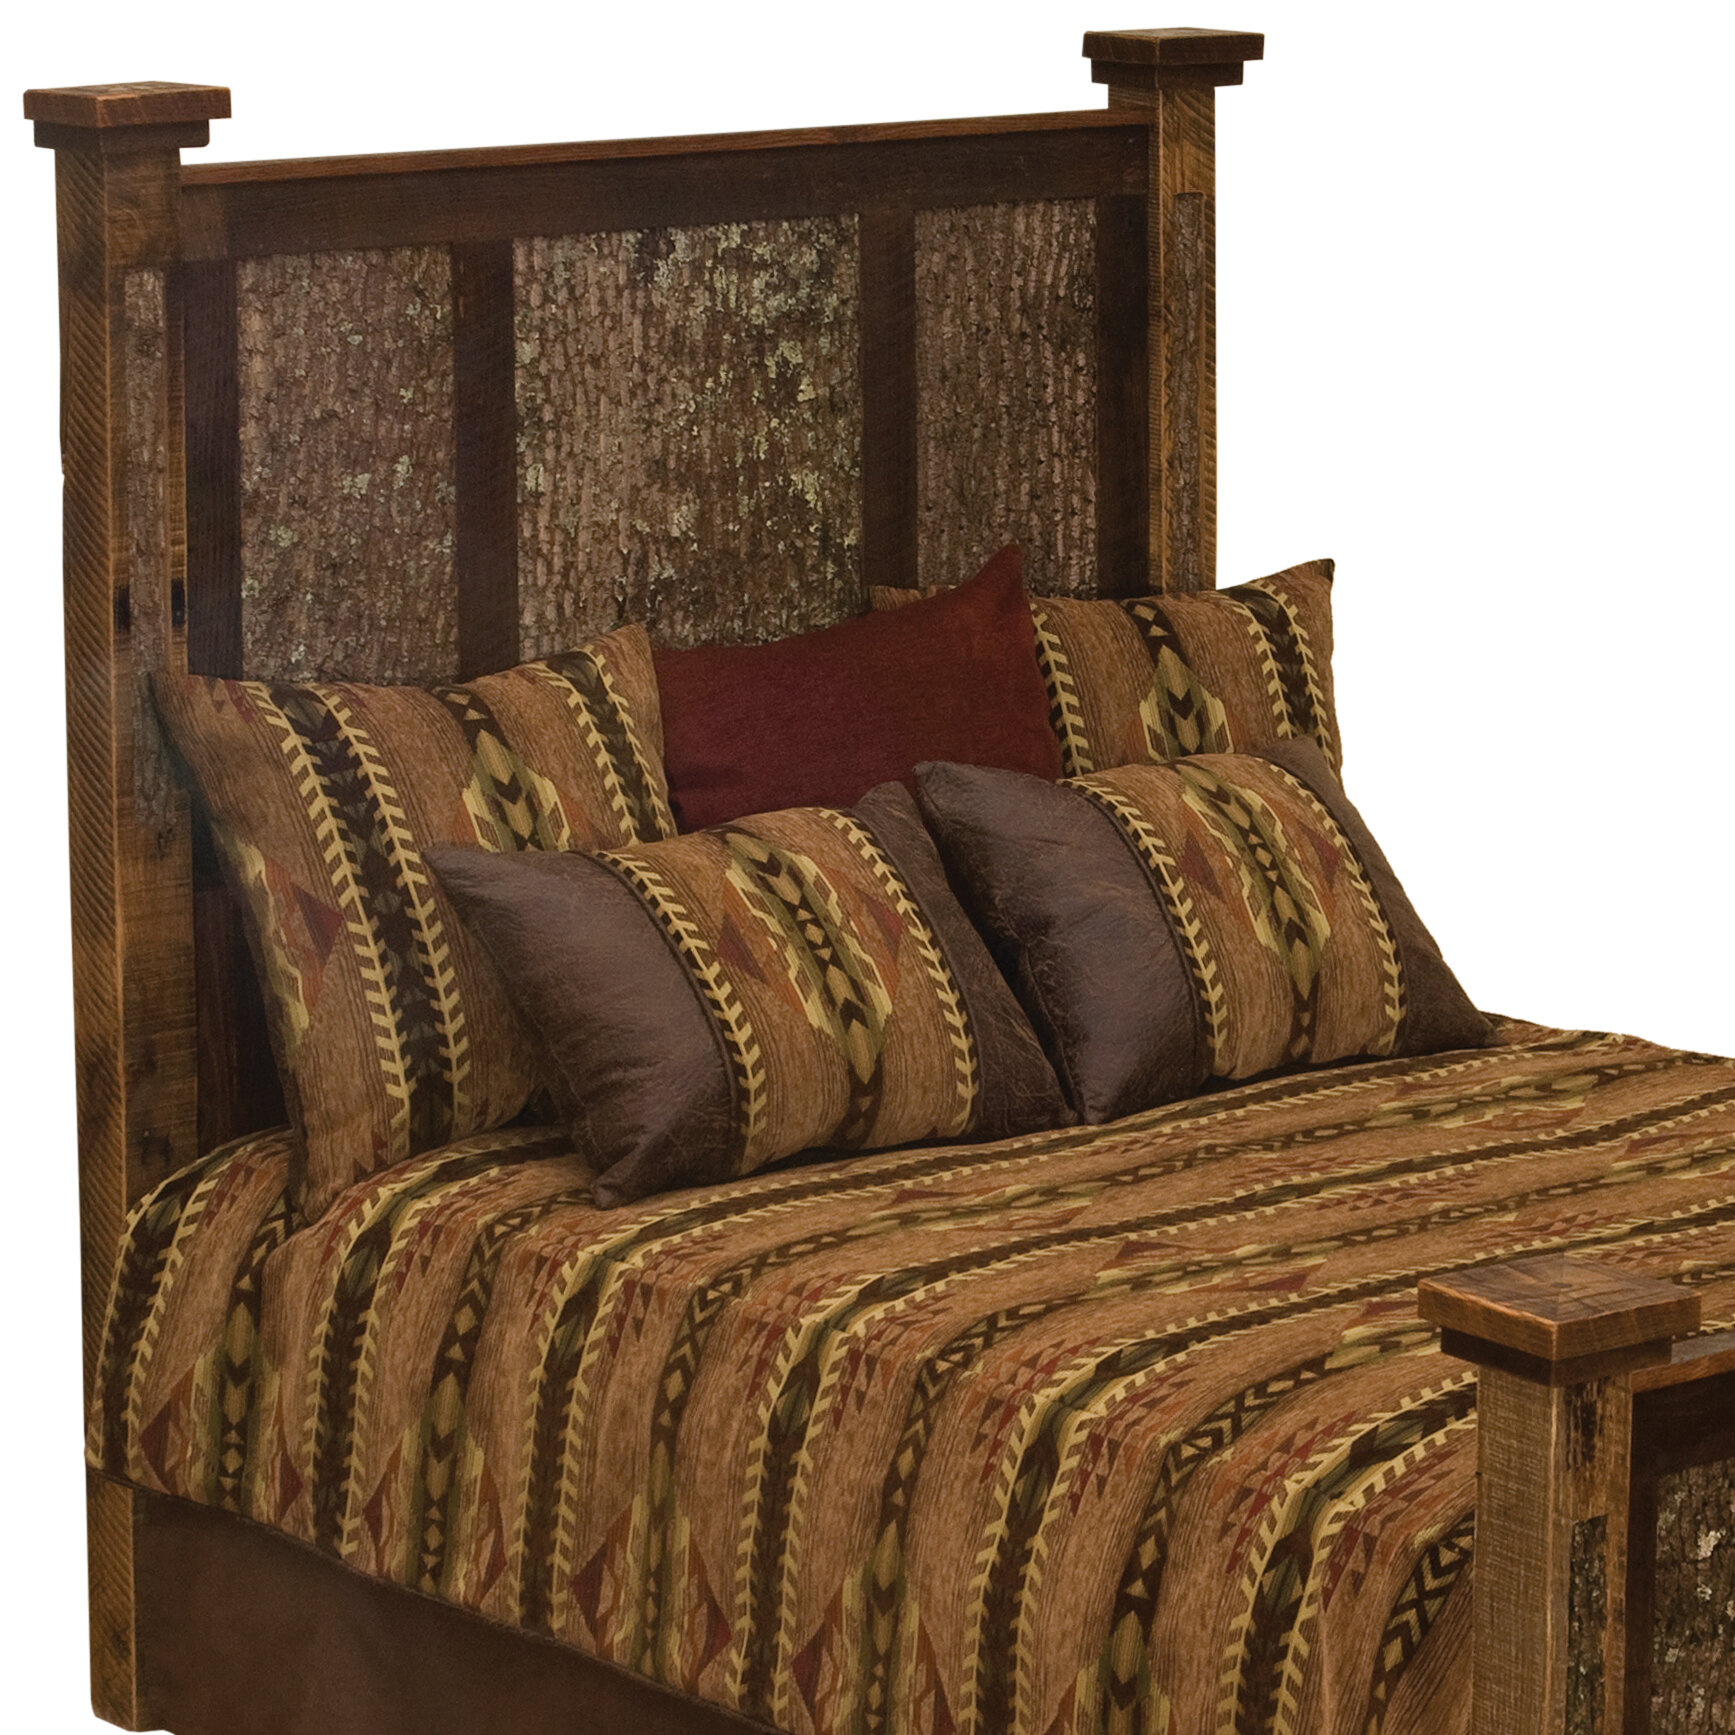 Fireside Lodge Barnwood Wood Panel Headboard Size: King